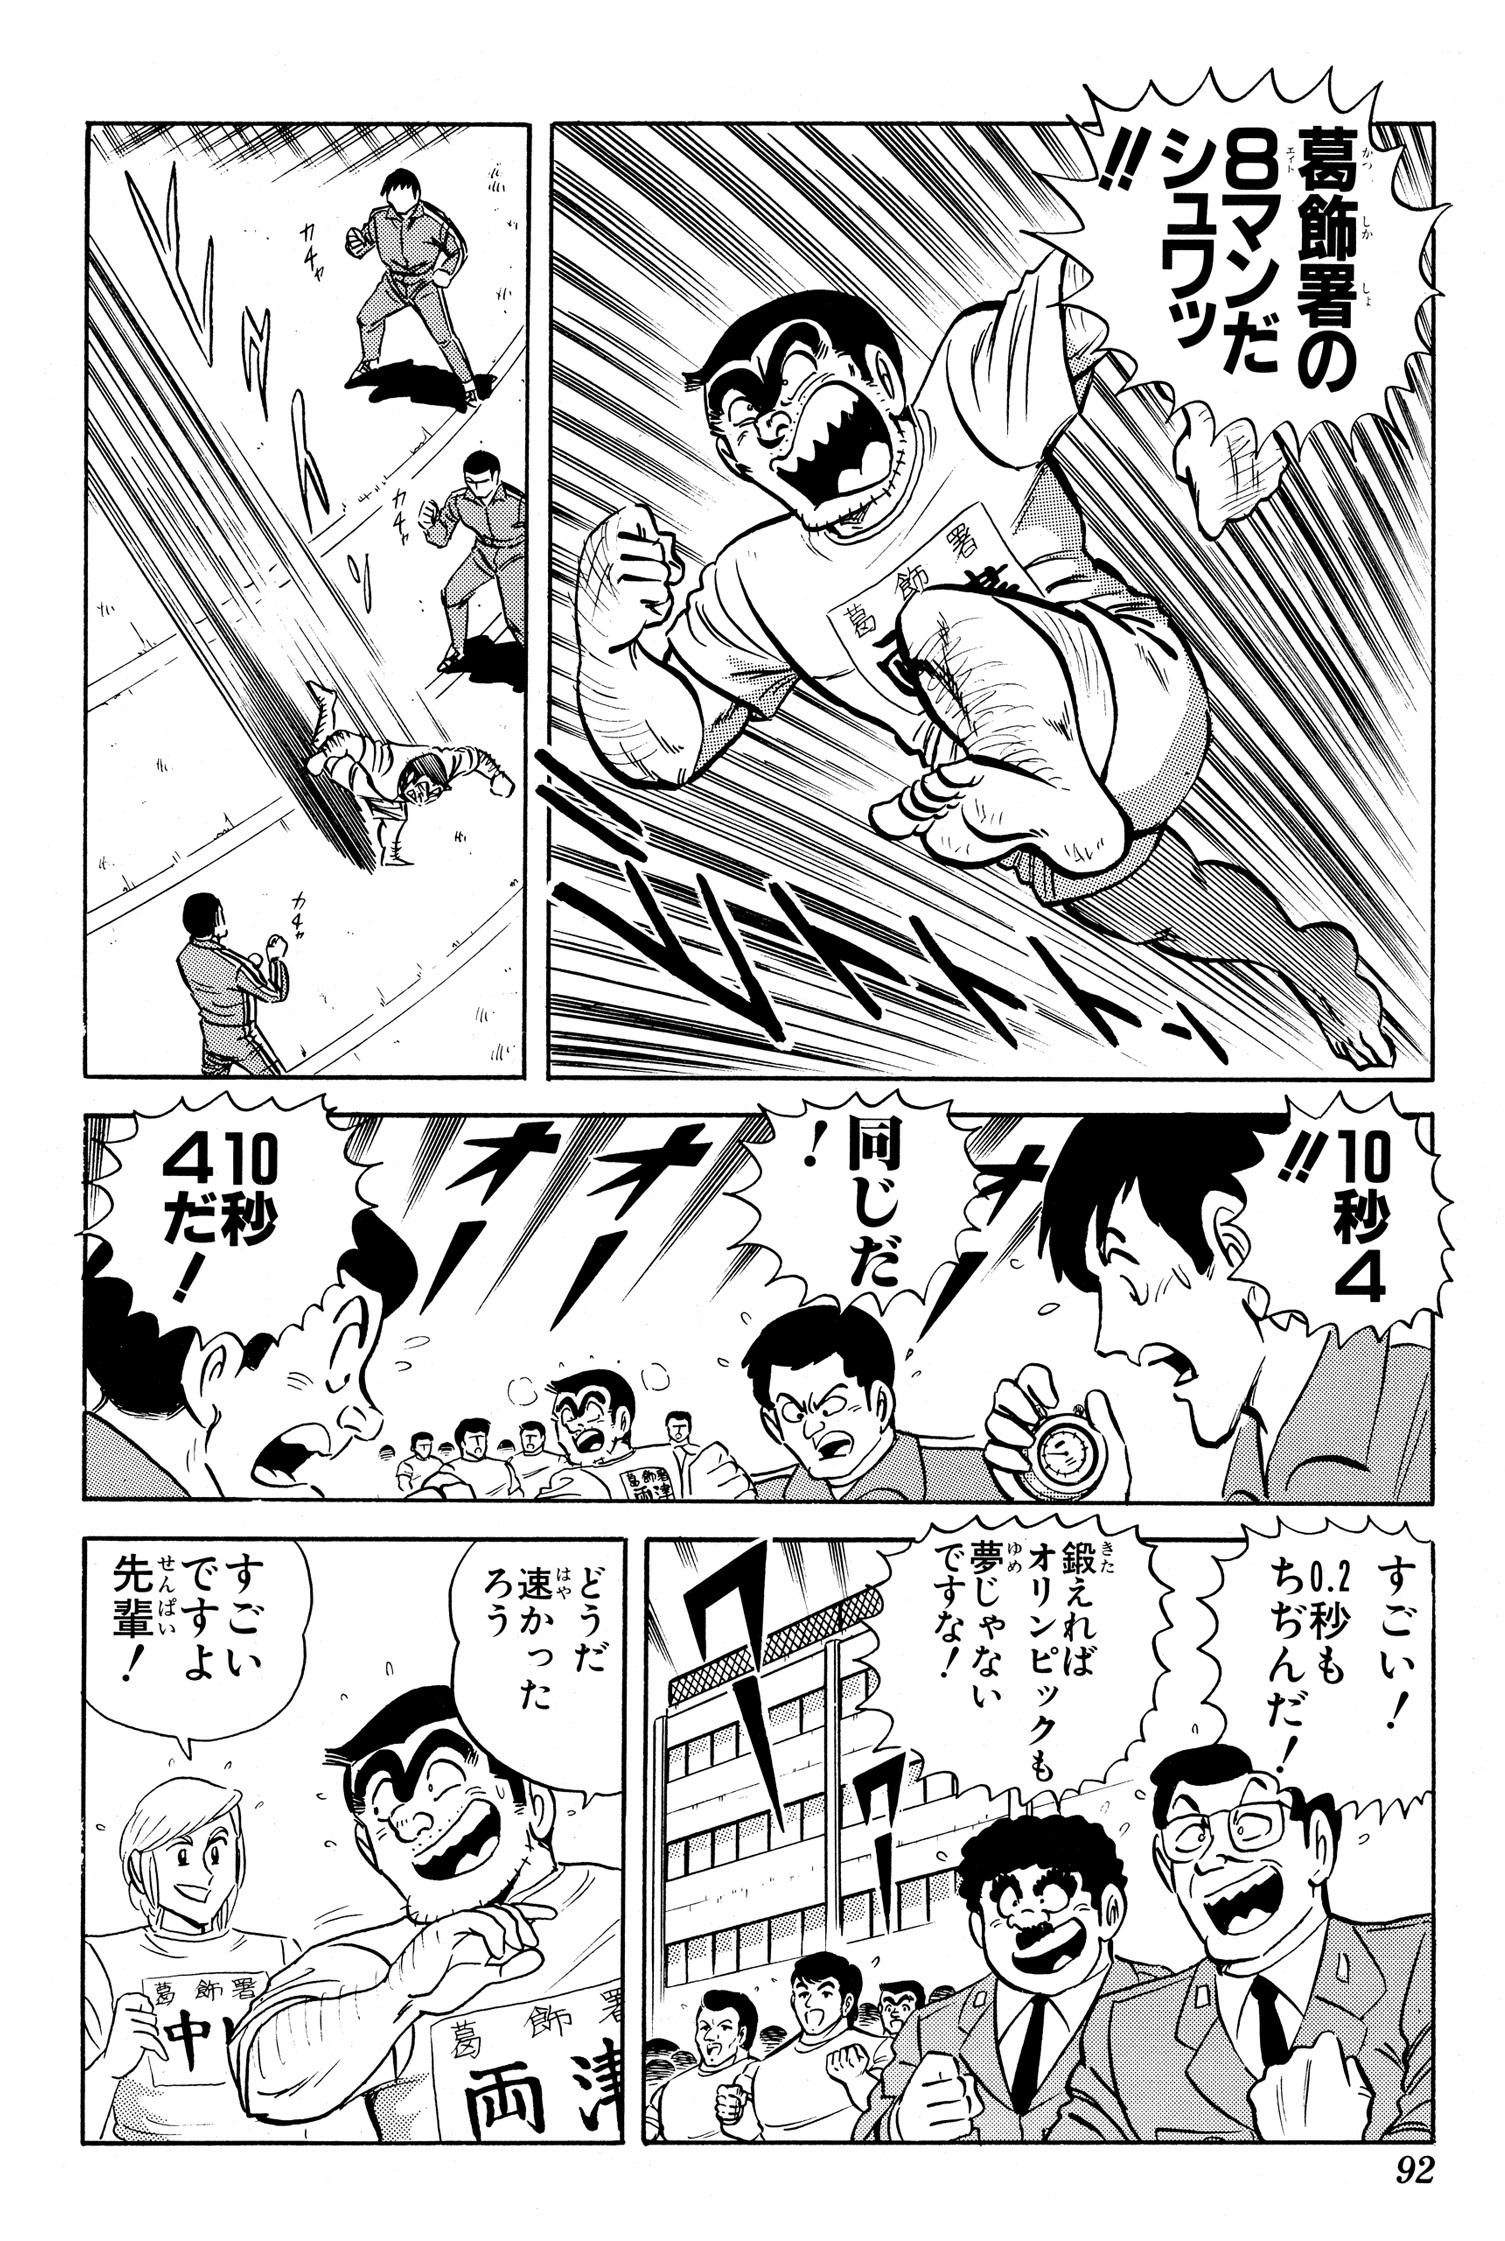 (C)秋本治・アトリエびーだま/集英社